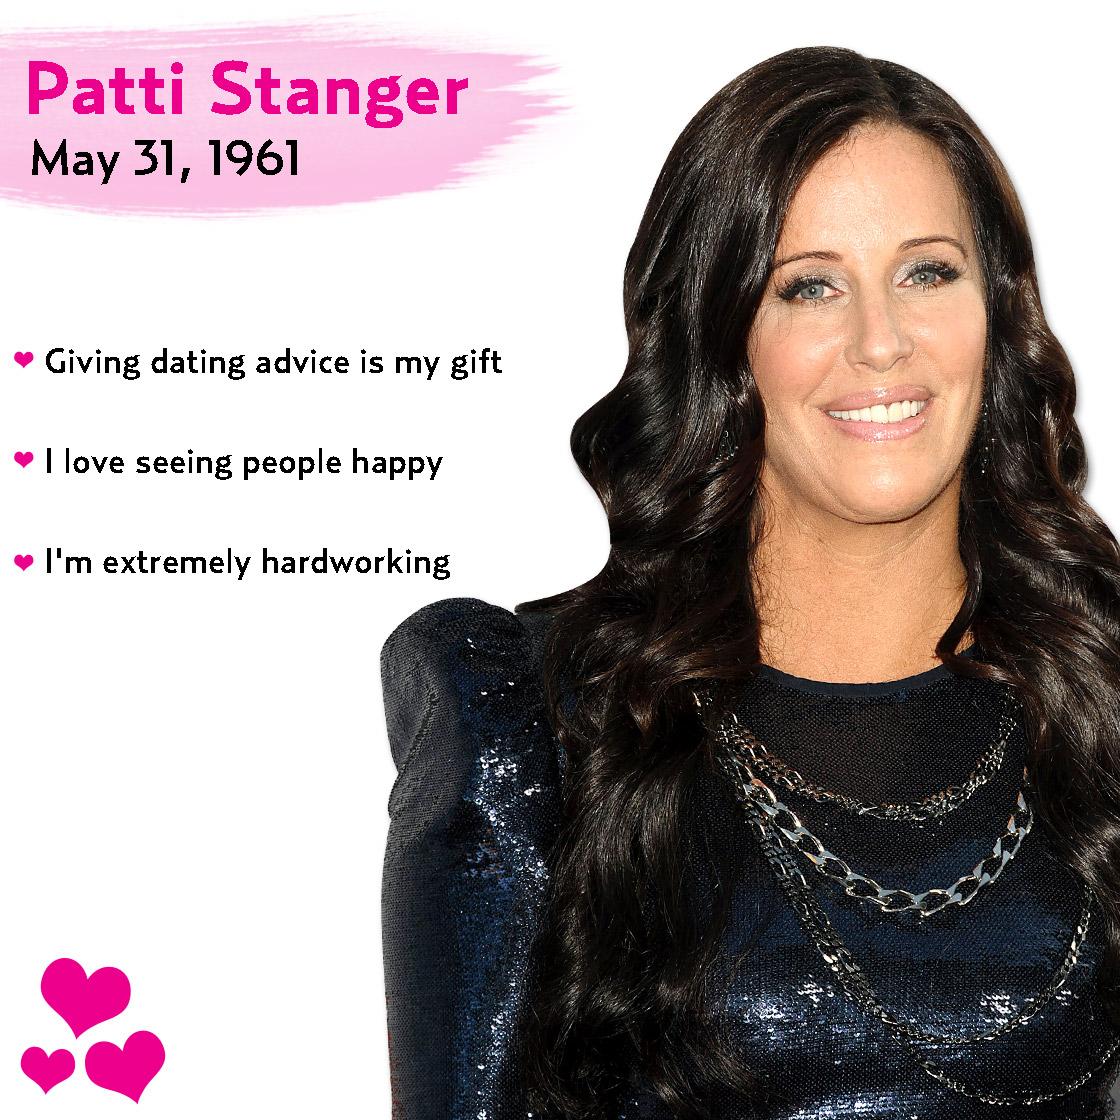 patti stanger online dating advice